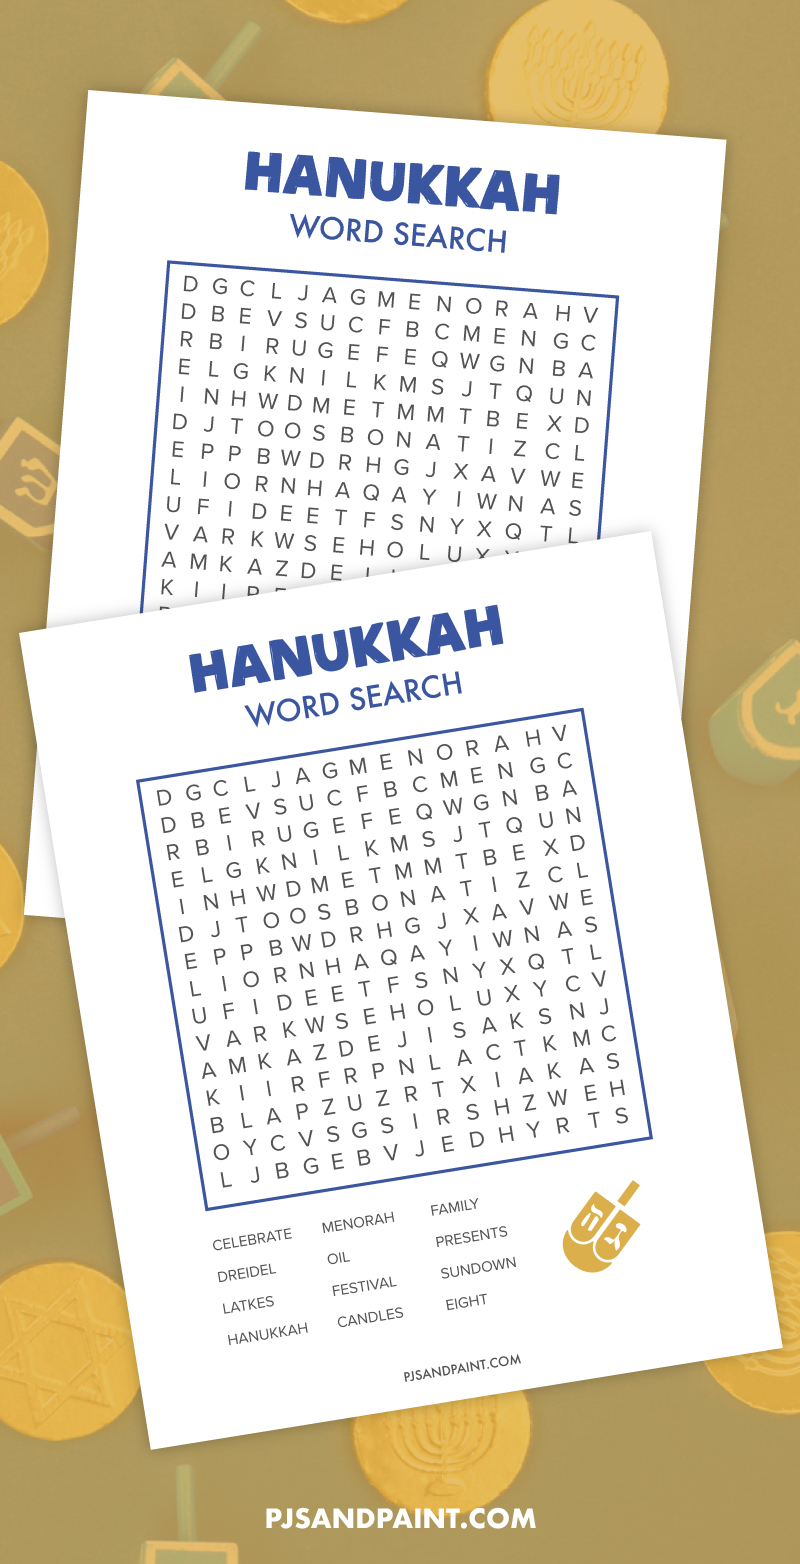 hanukkah word search 2